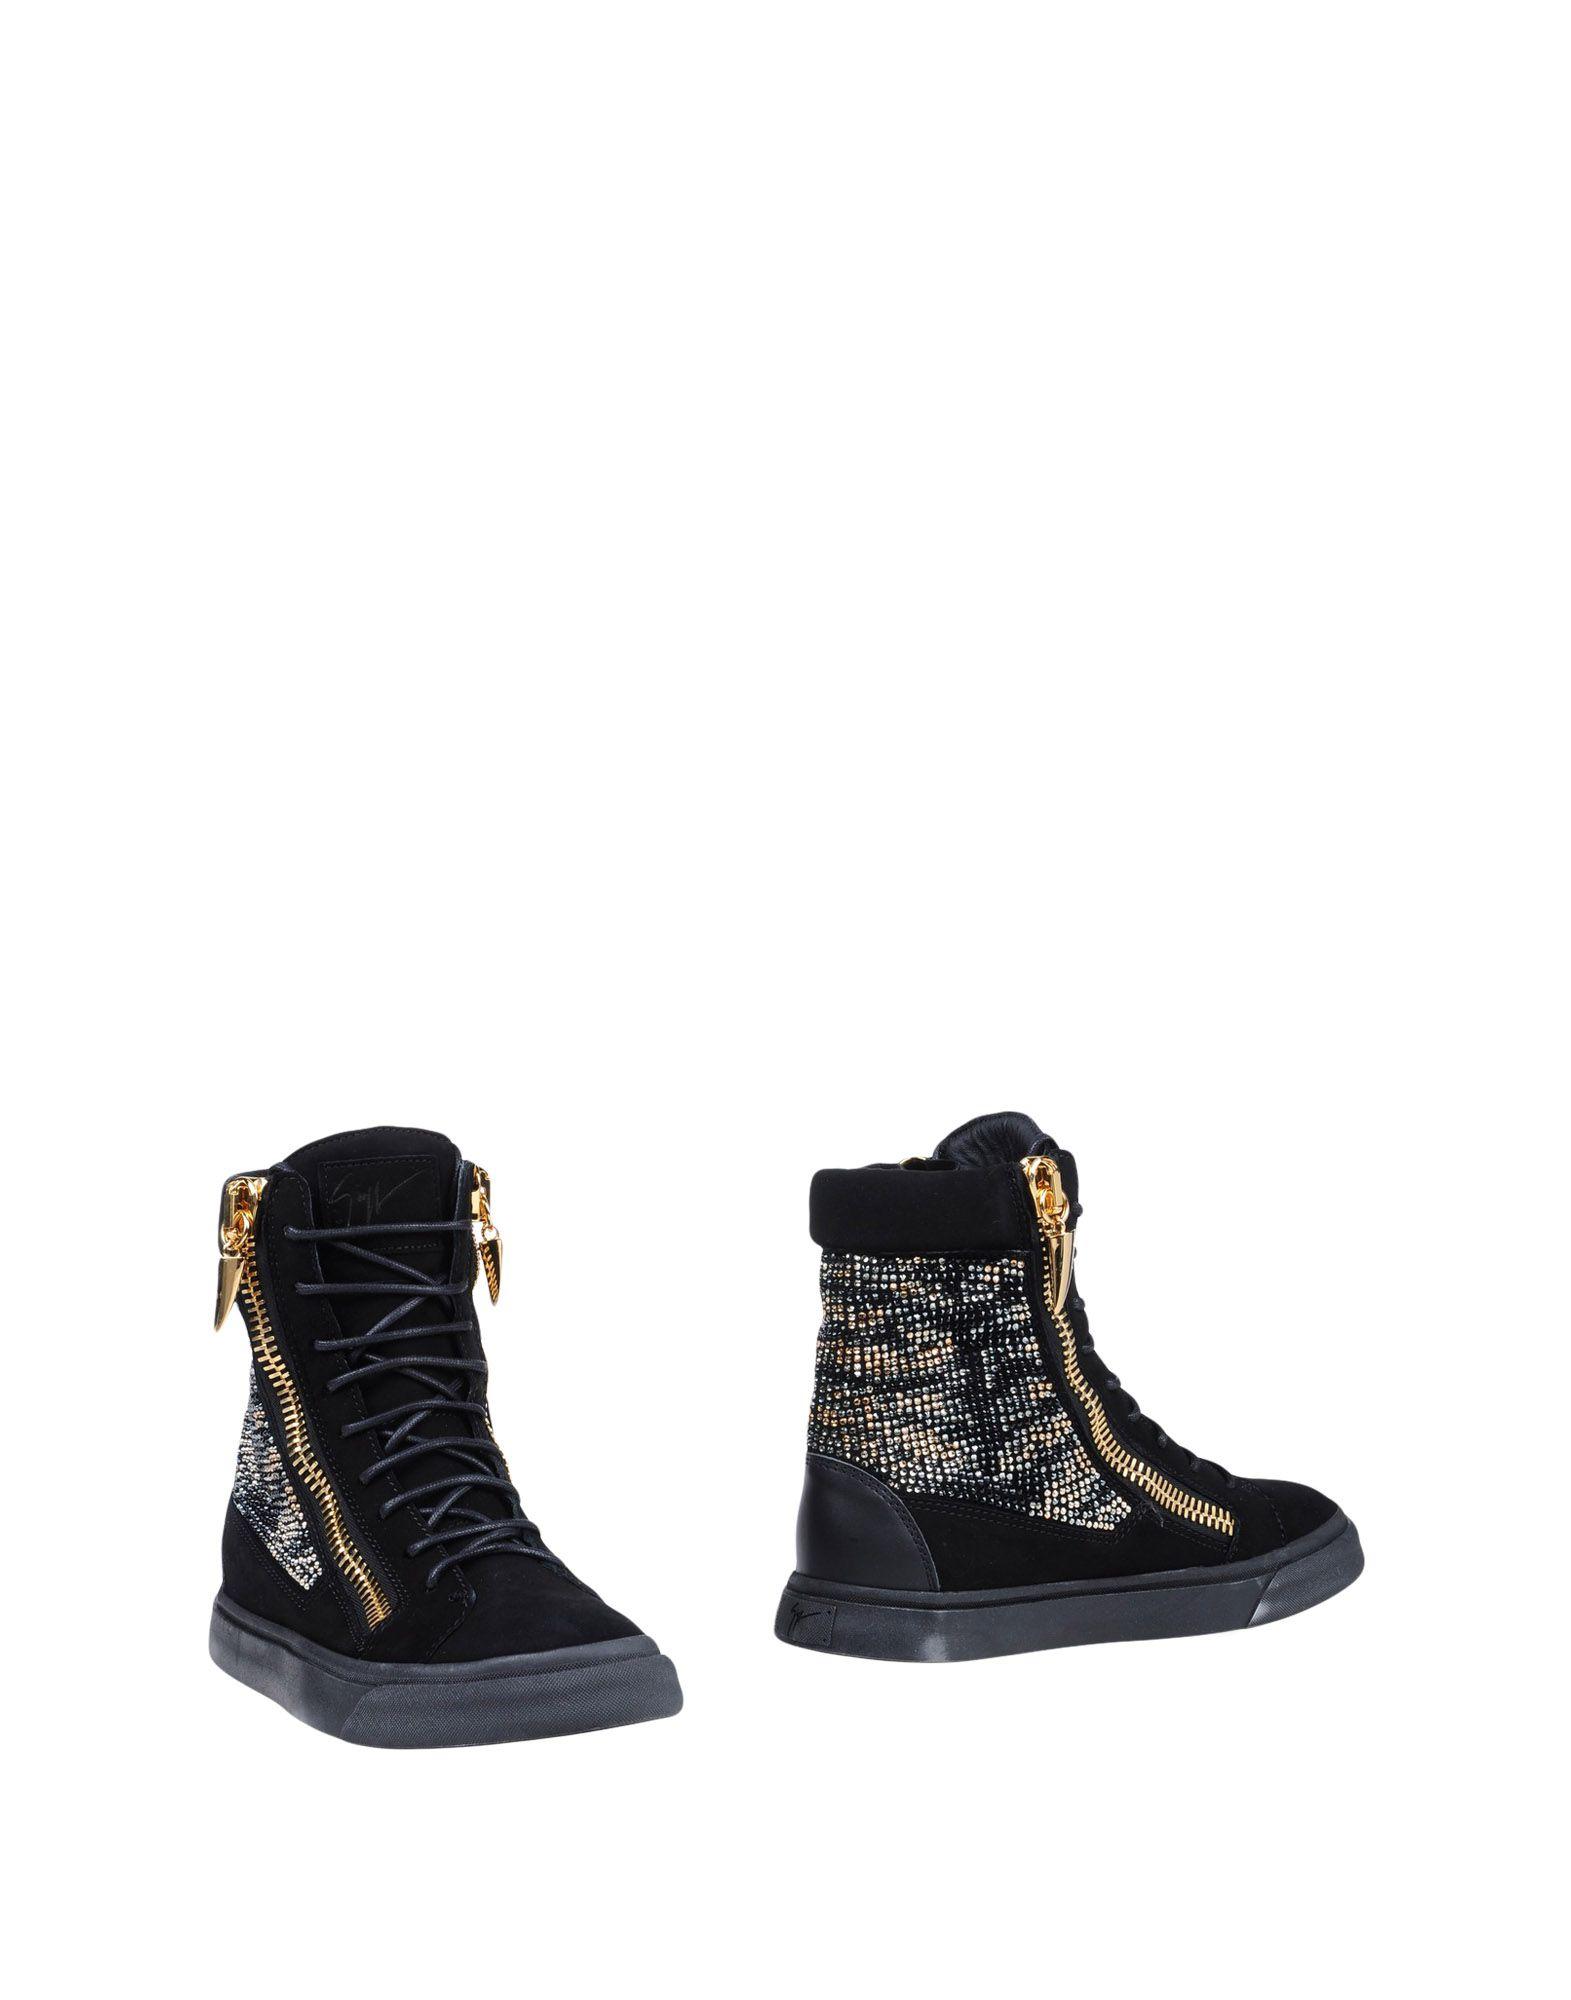 GIUSEPPE ZANOTTI DESIGN Полусапоги и высокие ботинки giuseppe zanotti design замшевые слиперы с заклепками